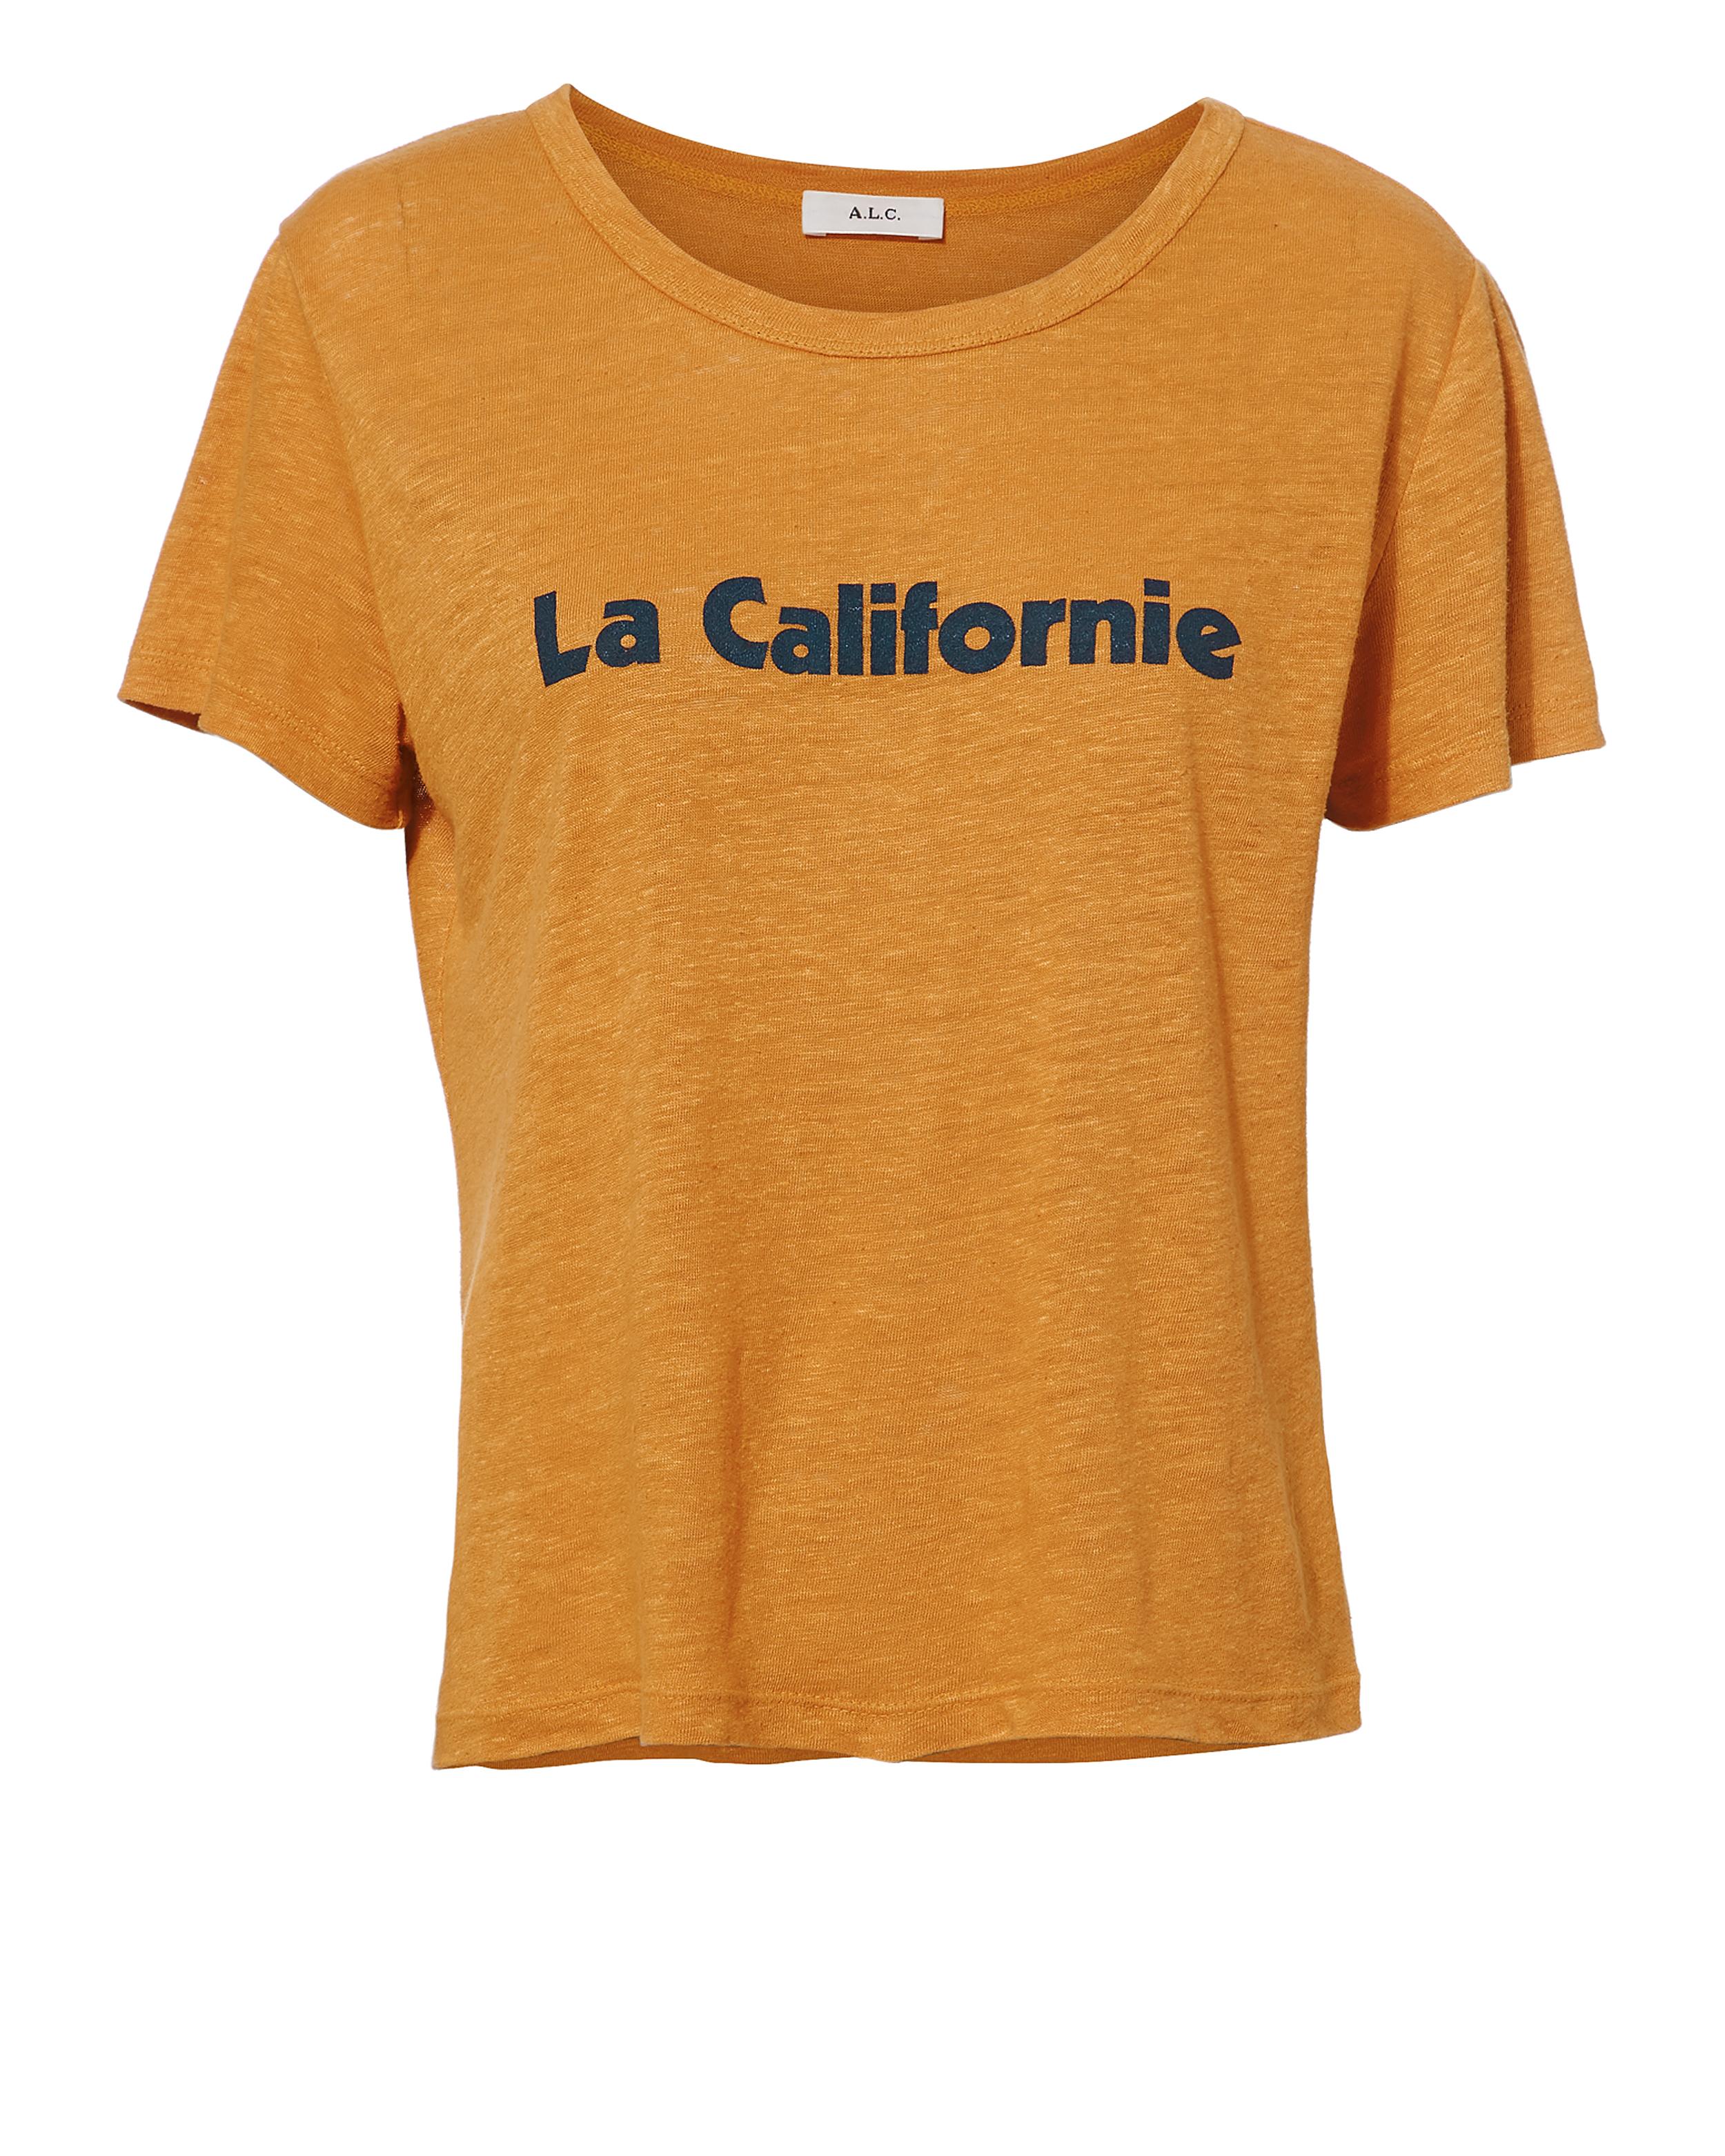 La Californie Tee by A.L.C.